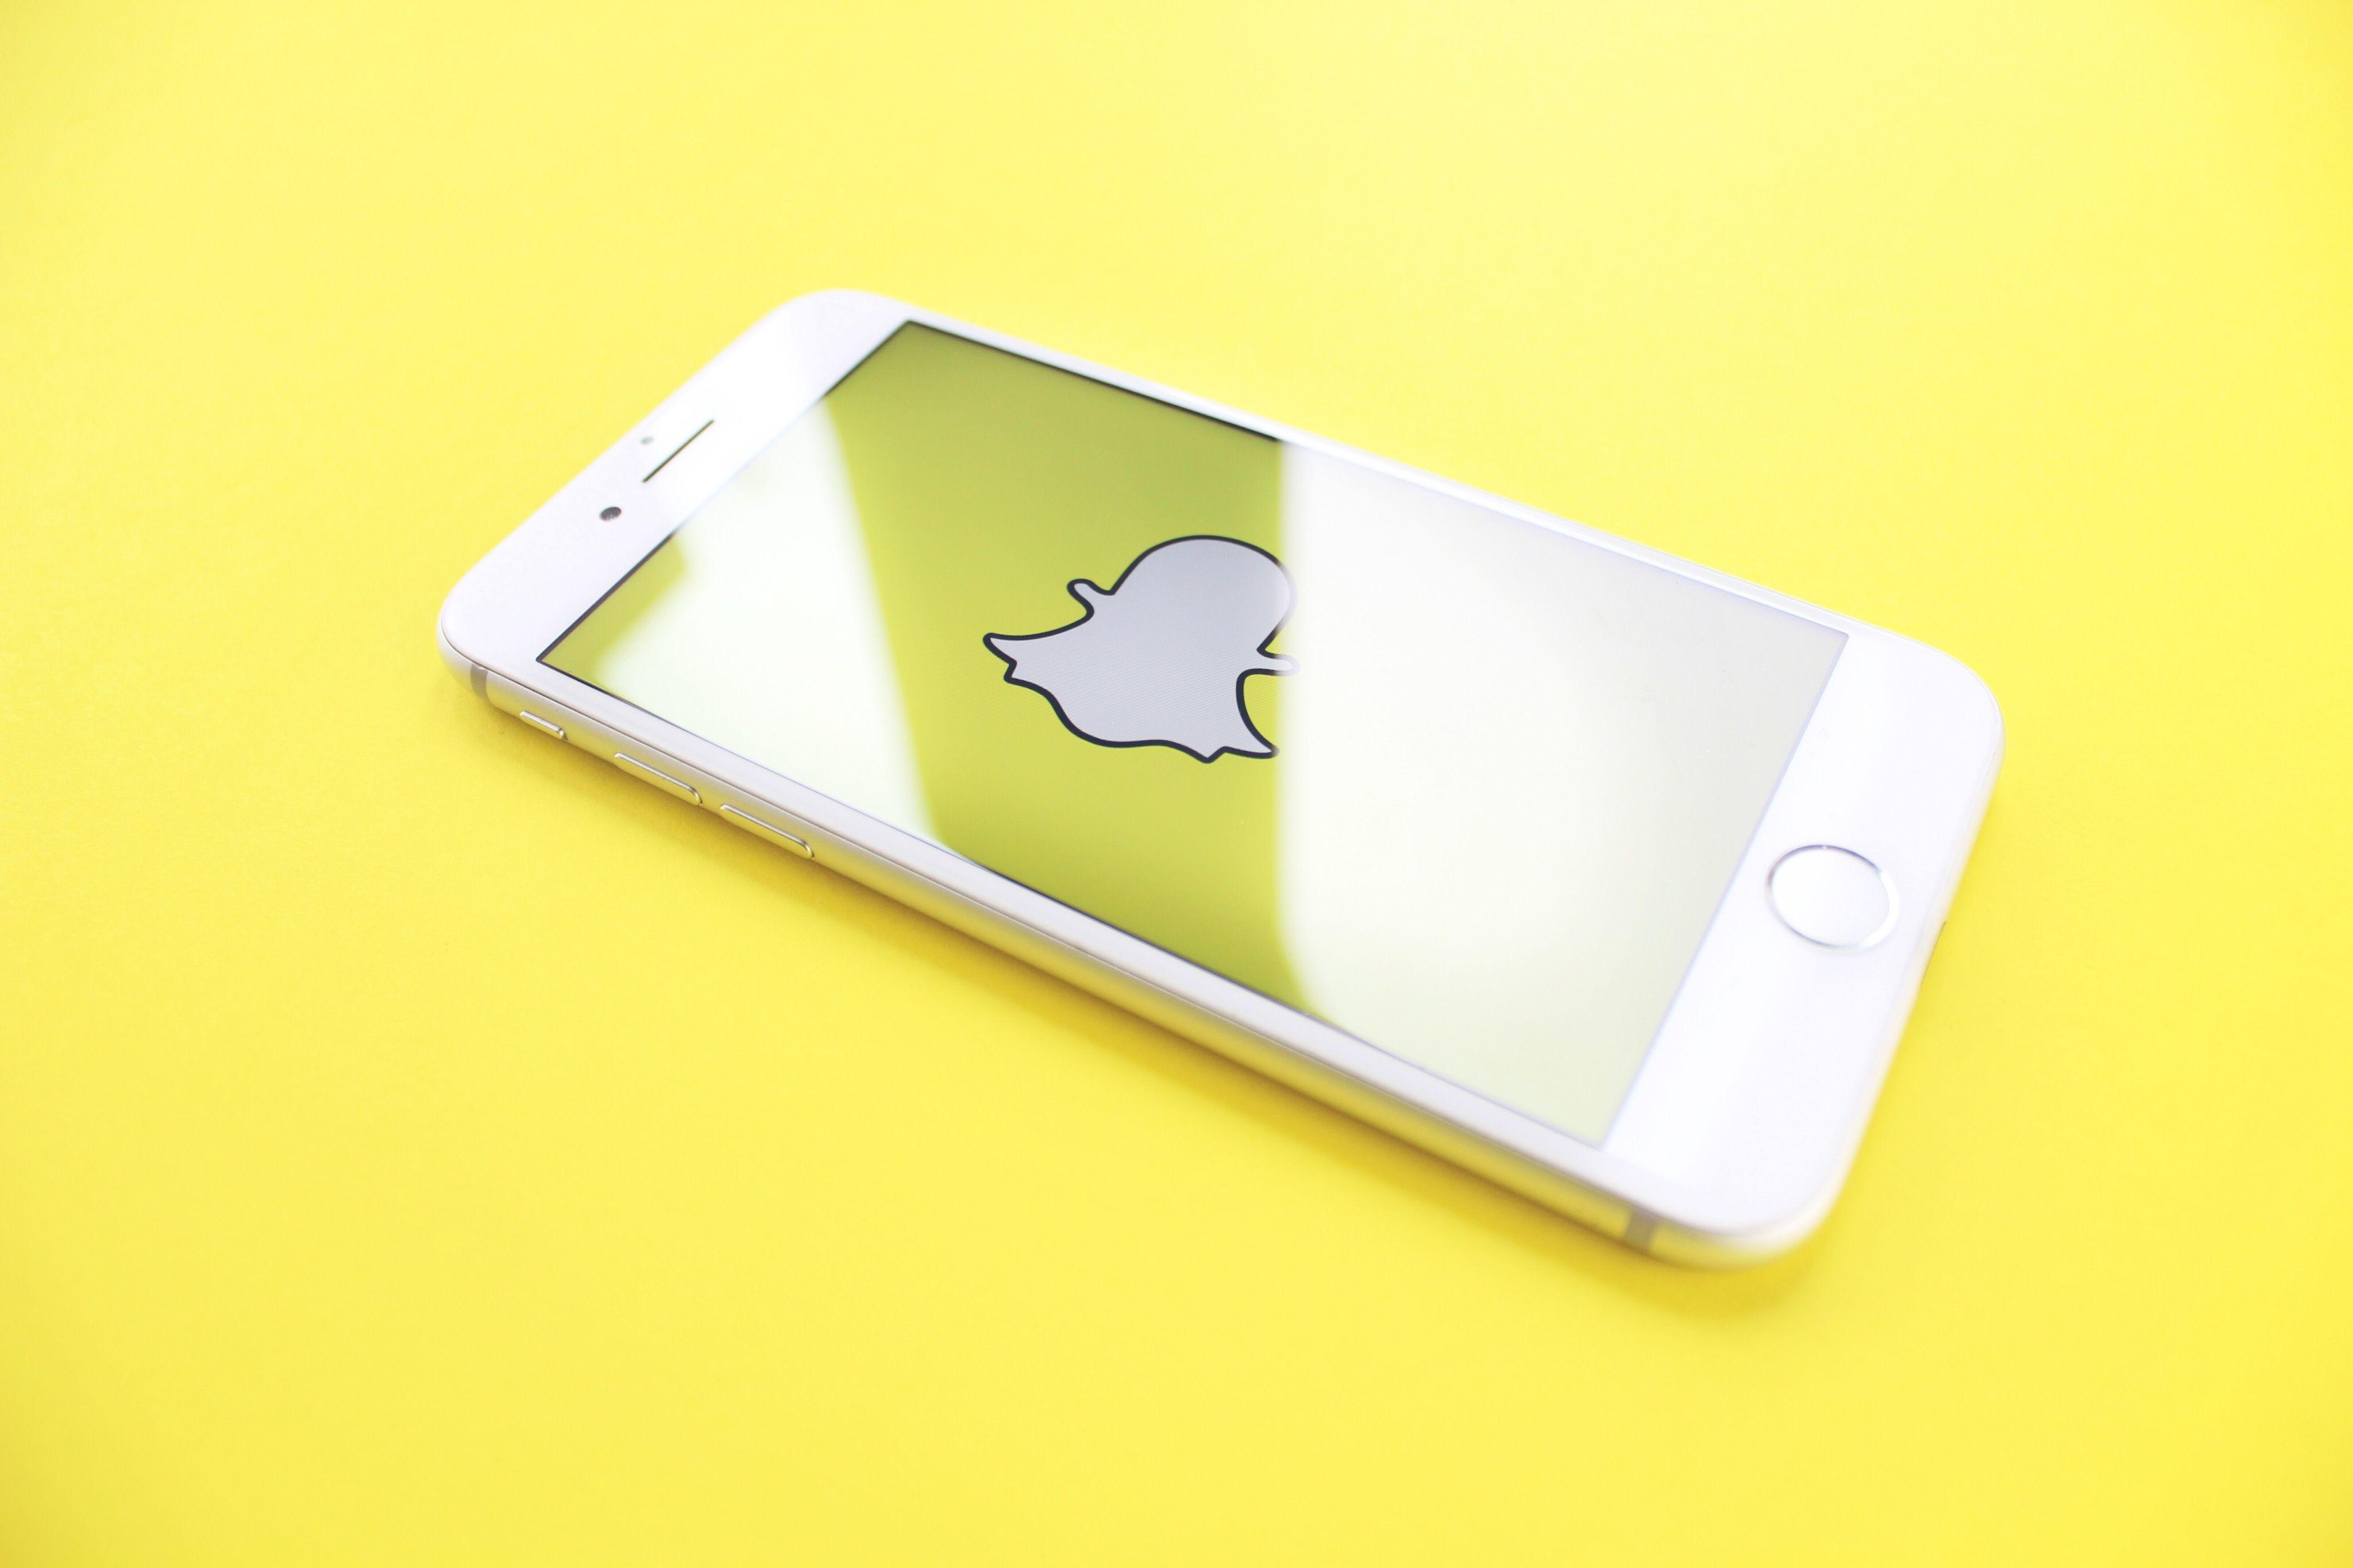 Yellow aesthetic wallpaper 🤩 🌙🌙🌙 Snapchat marketing